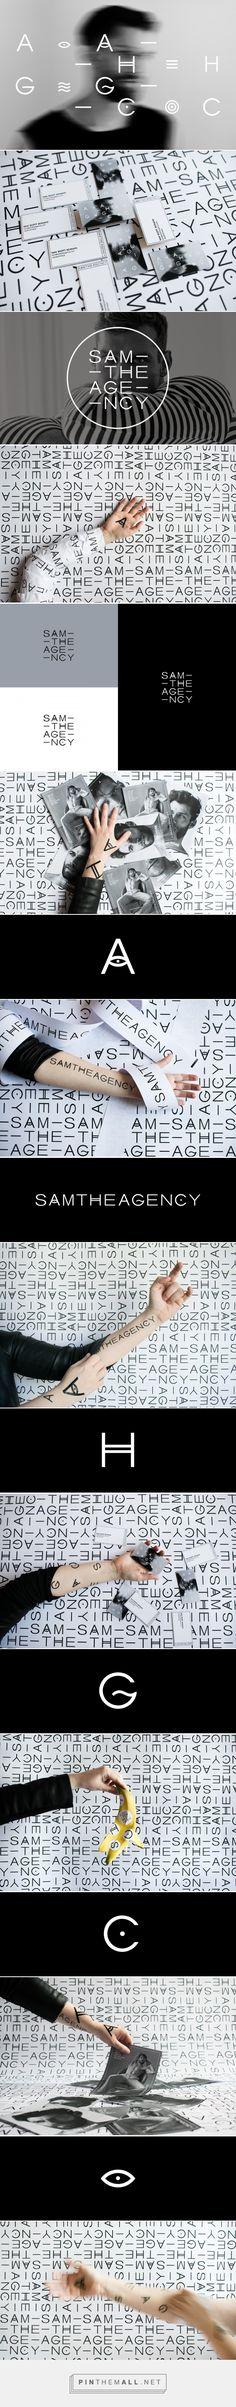 SAMTHEAGENCY on Behance - created via https://pinthemall.net